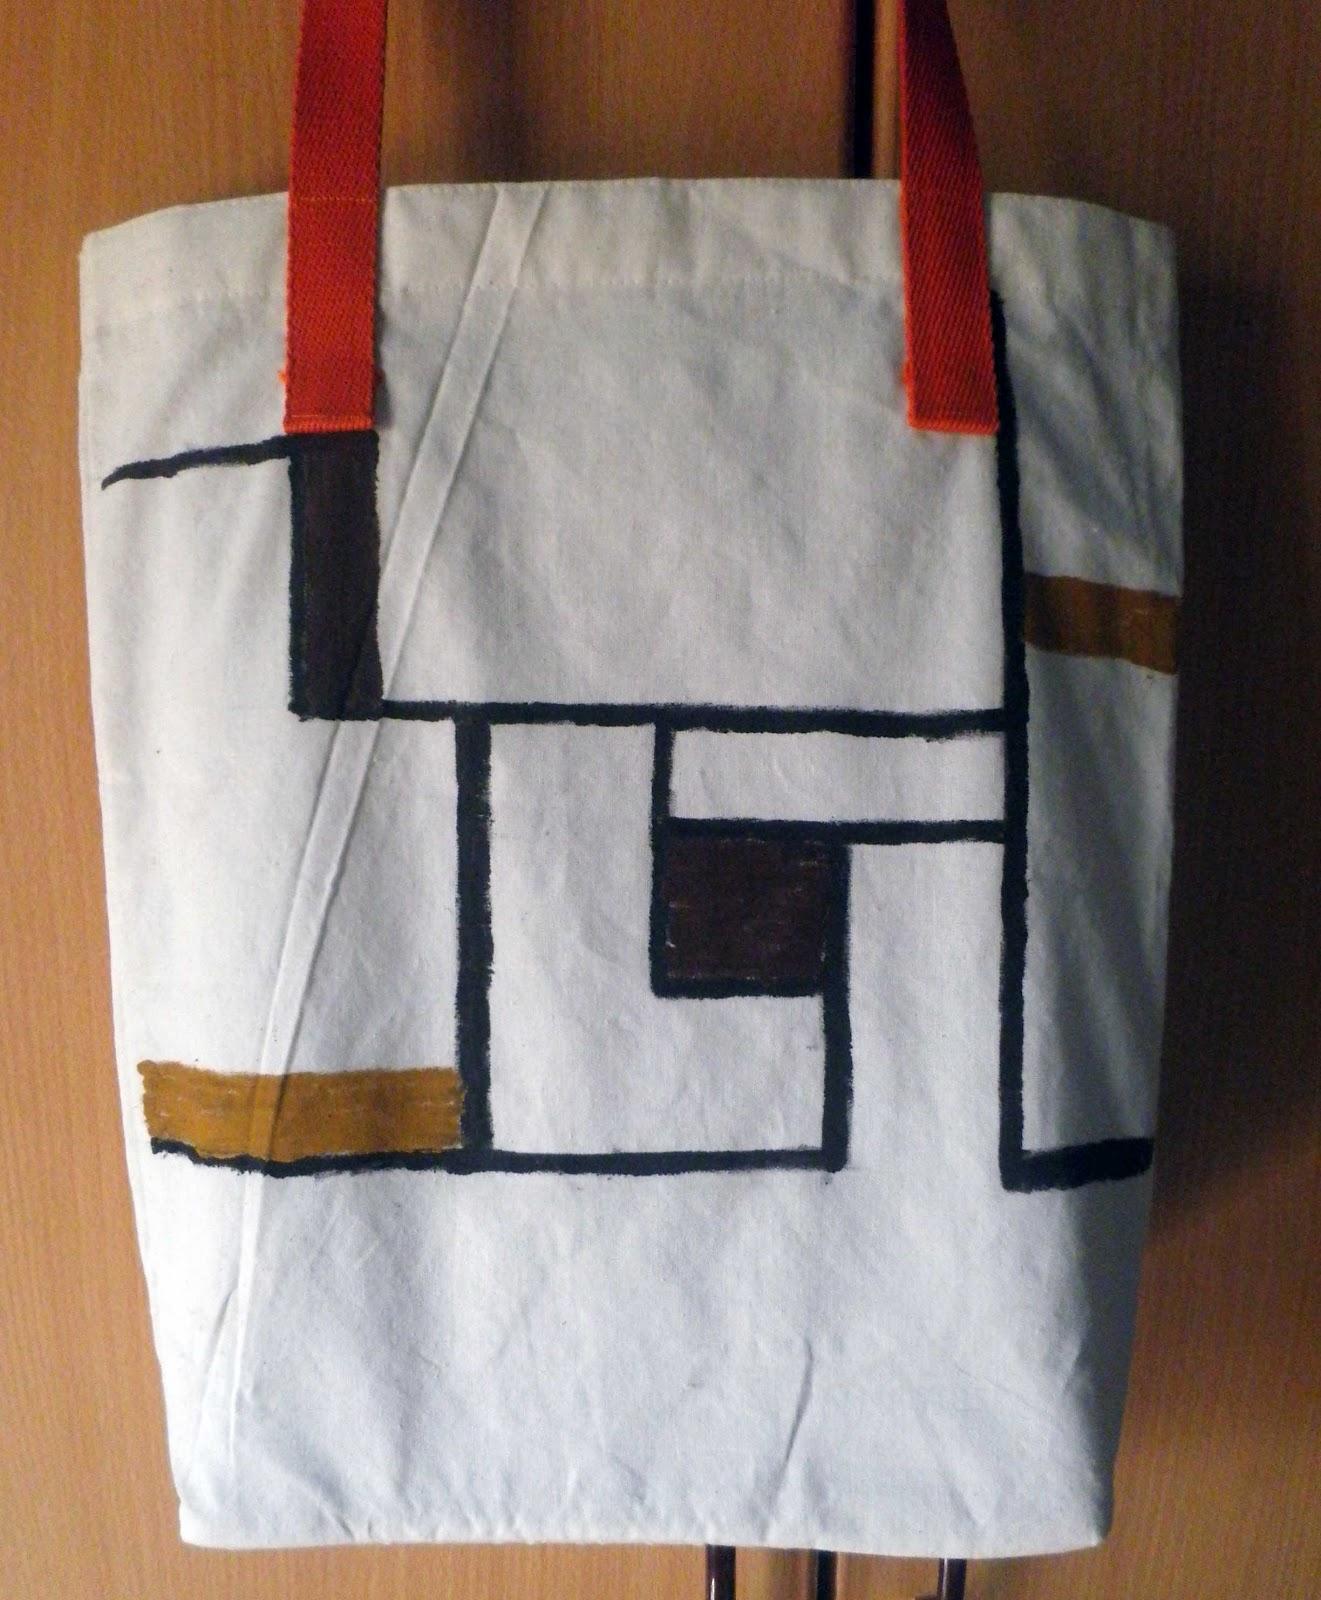 Tas Canvas Custom Harga Murah Kanvas T Rounded 3 In 1 Bisa Dijinjing Diselempang Dipunggung Yeakh Grosir Jual Toko Sentra